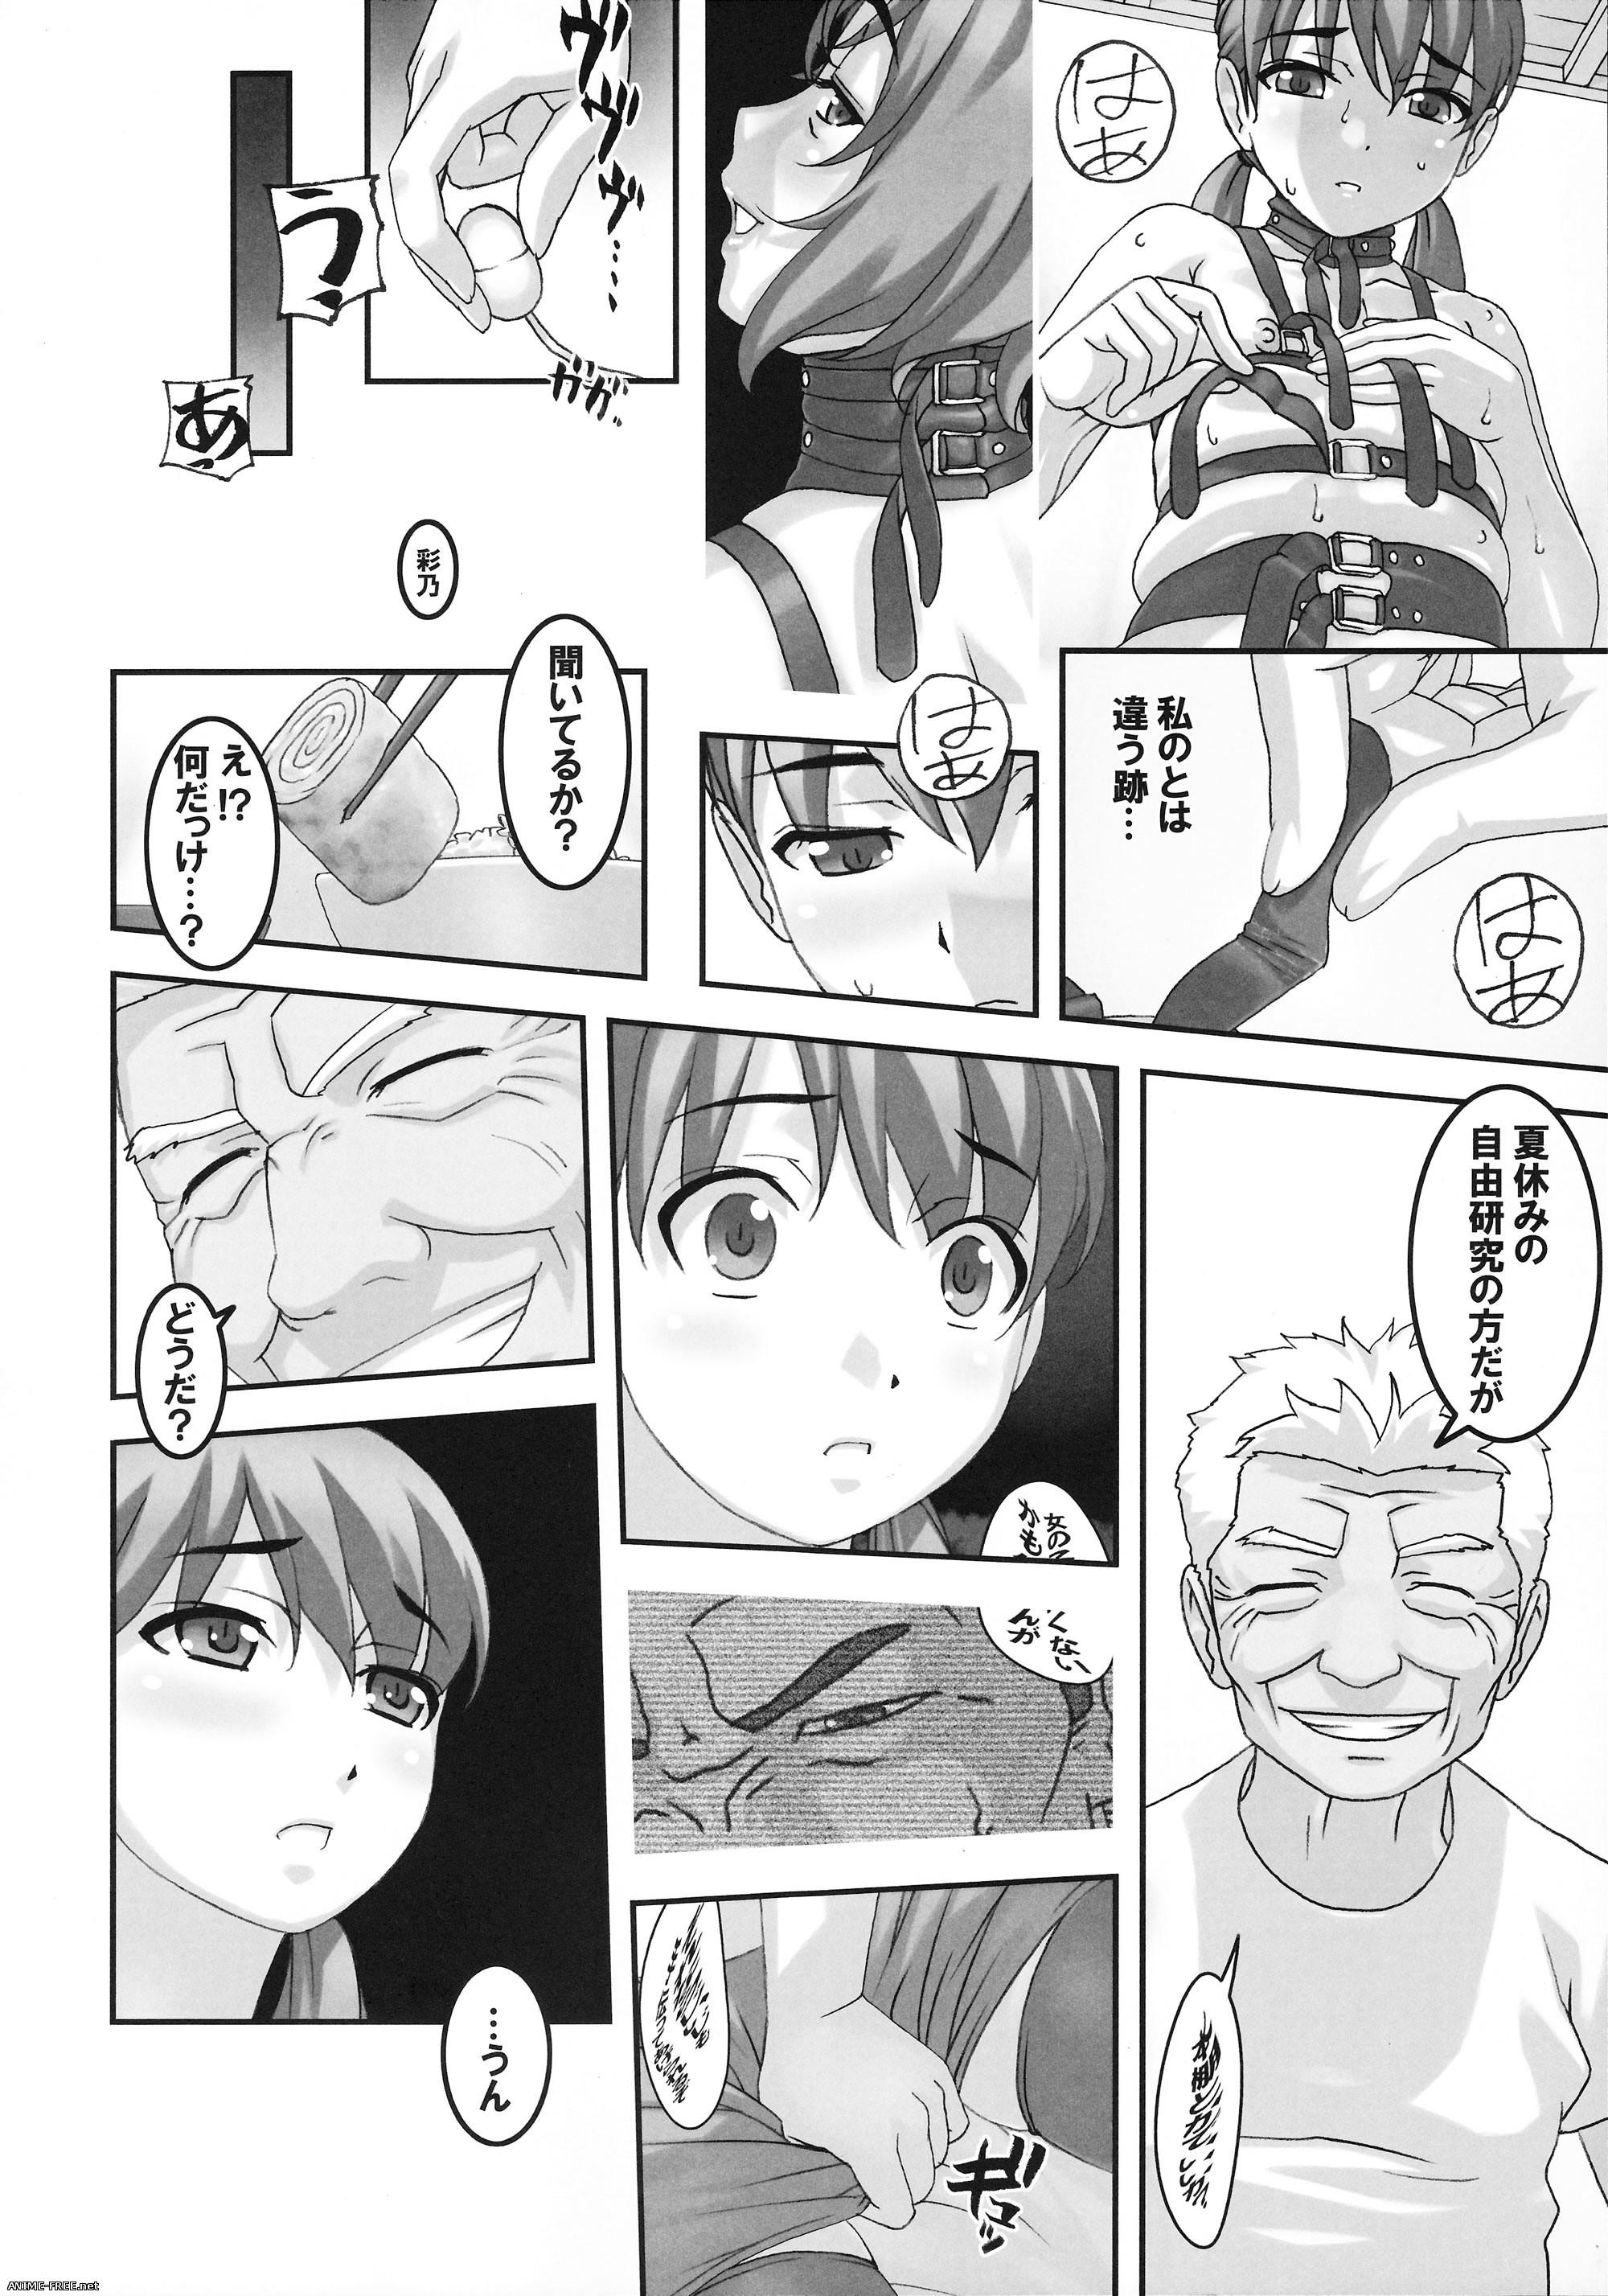 Sakura Romako / Tairiku Kan Dandoudan-dan / Saromako - (сборник манги) [Cen] [JAP,ENG,RUS] Manga Hentai